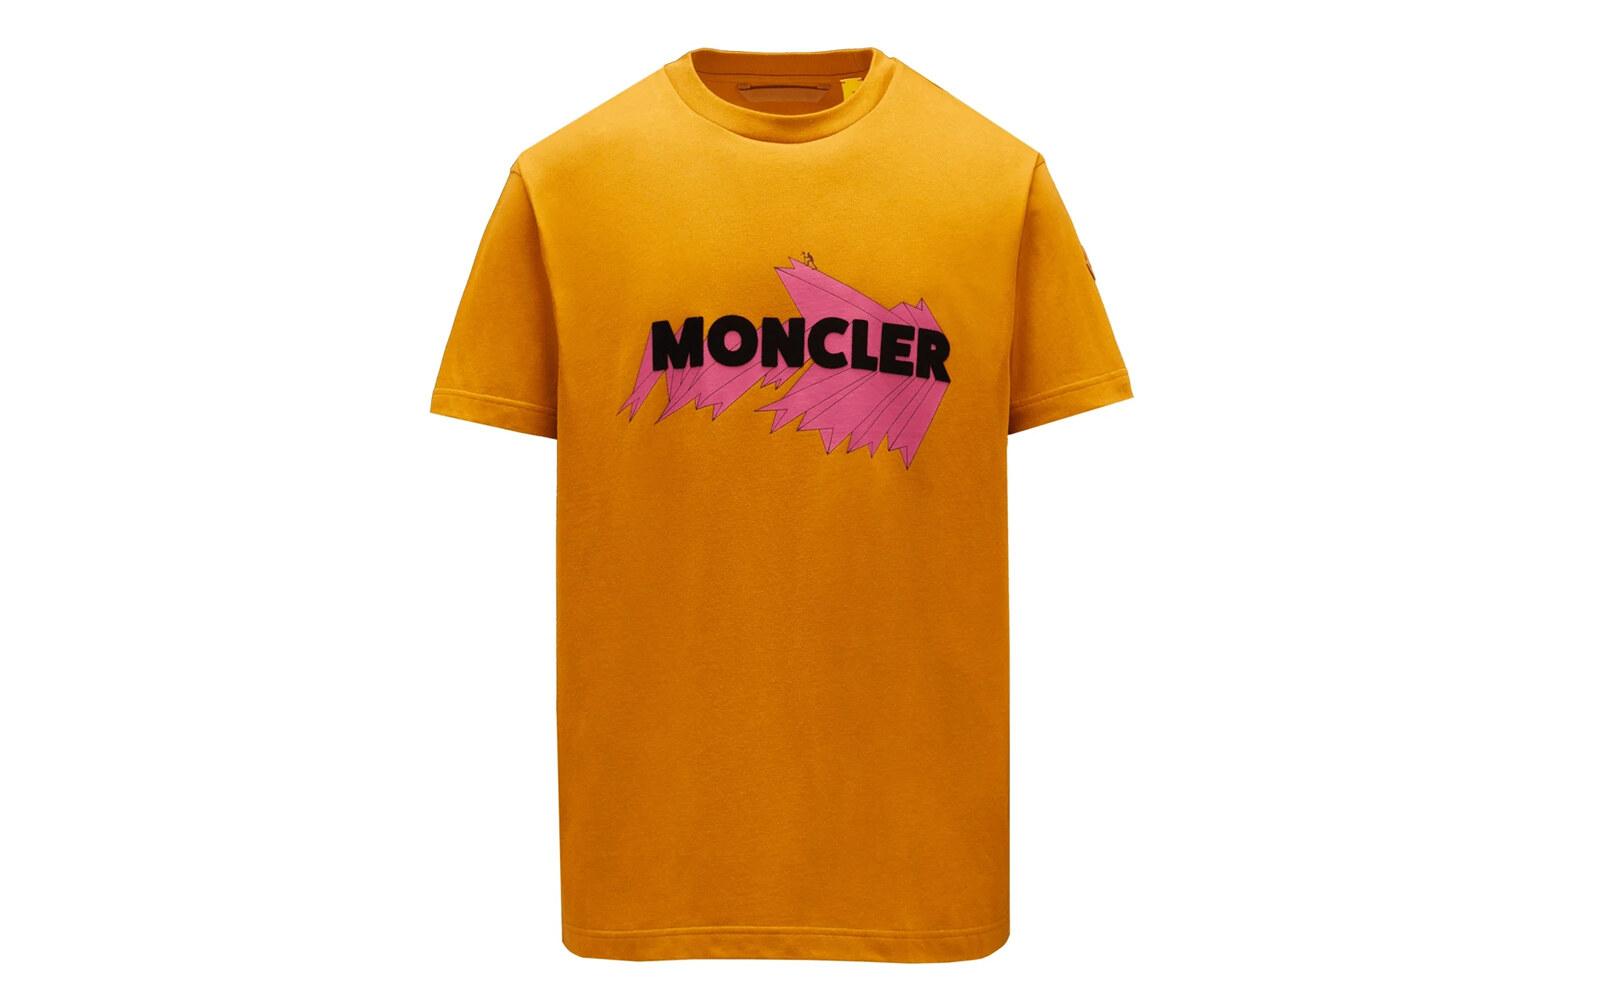 2 Moncler 1952 Collection